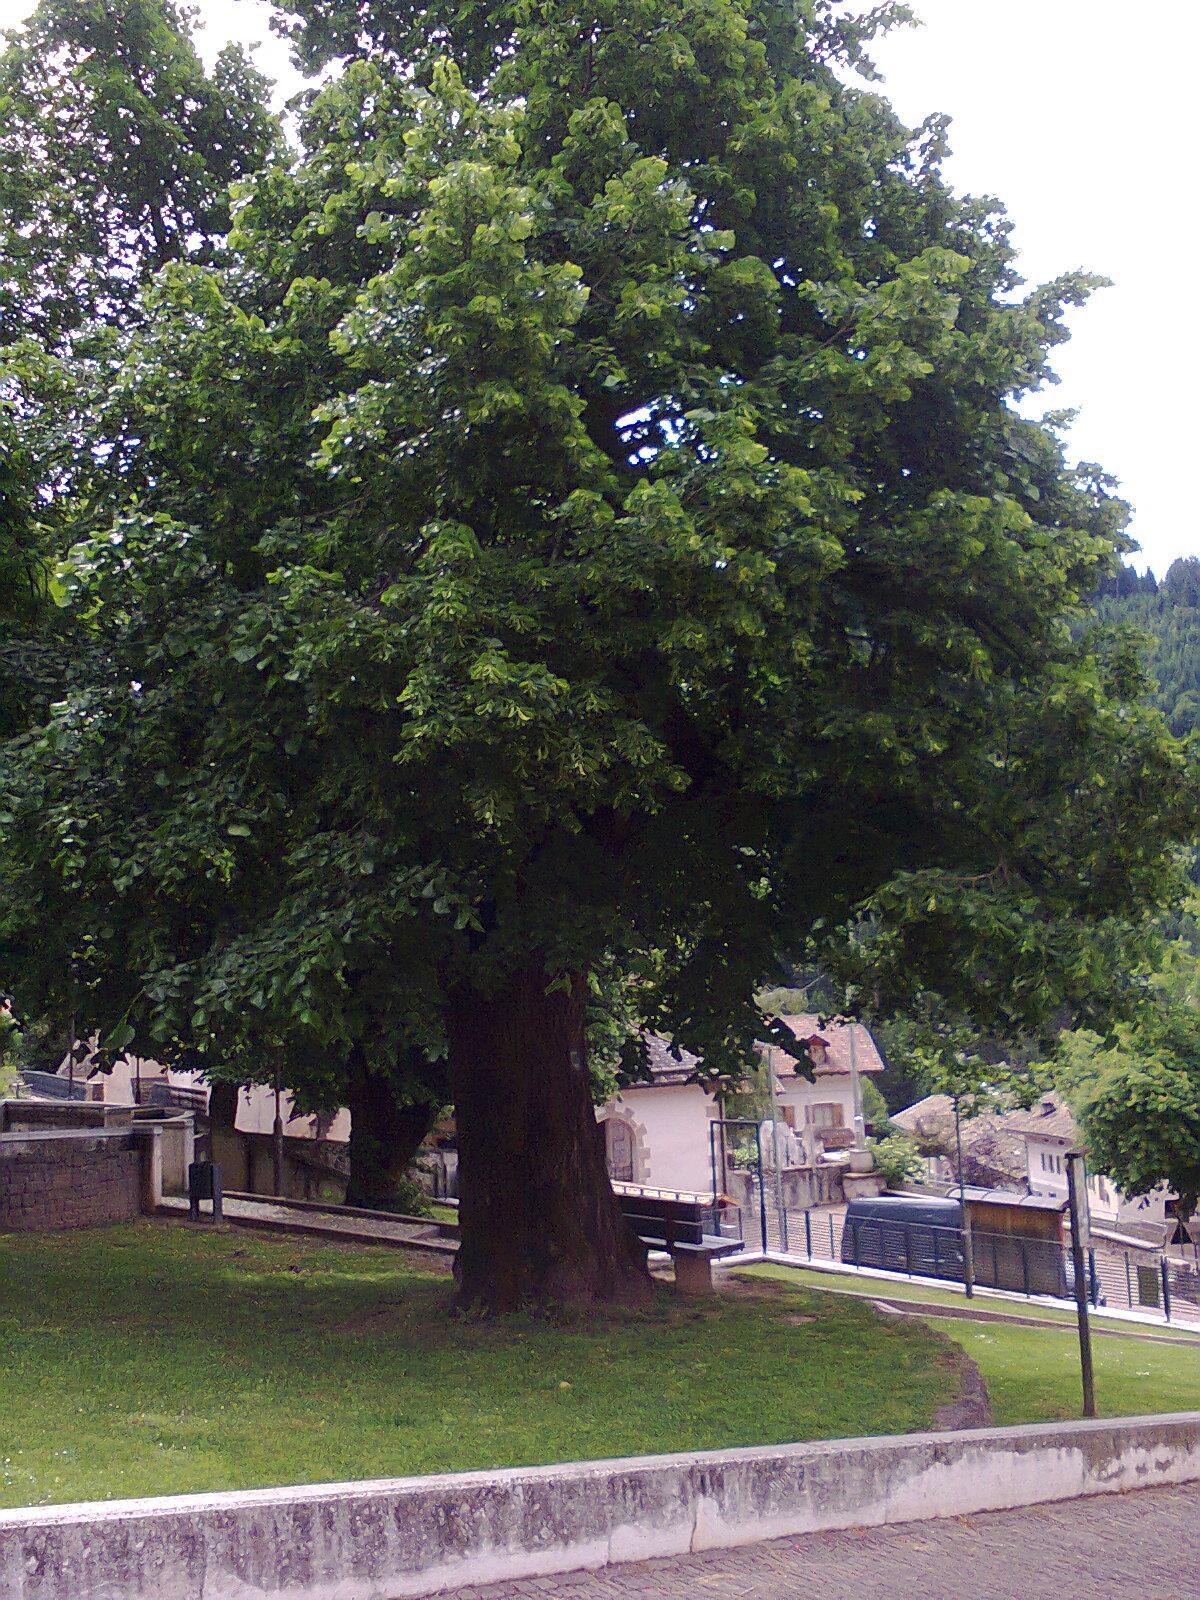 600-jährige Linde in Truden